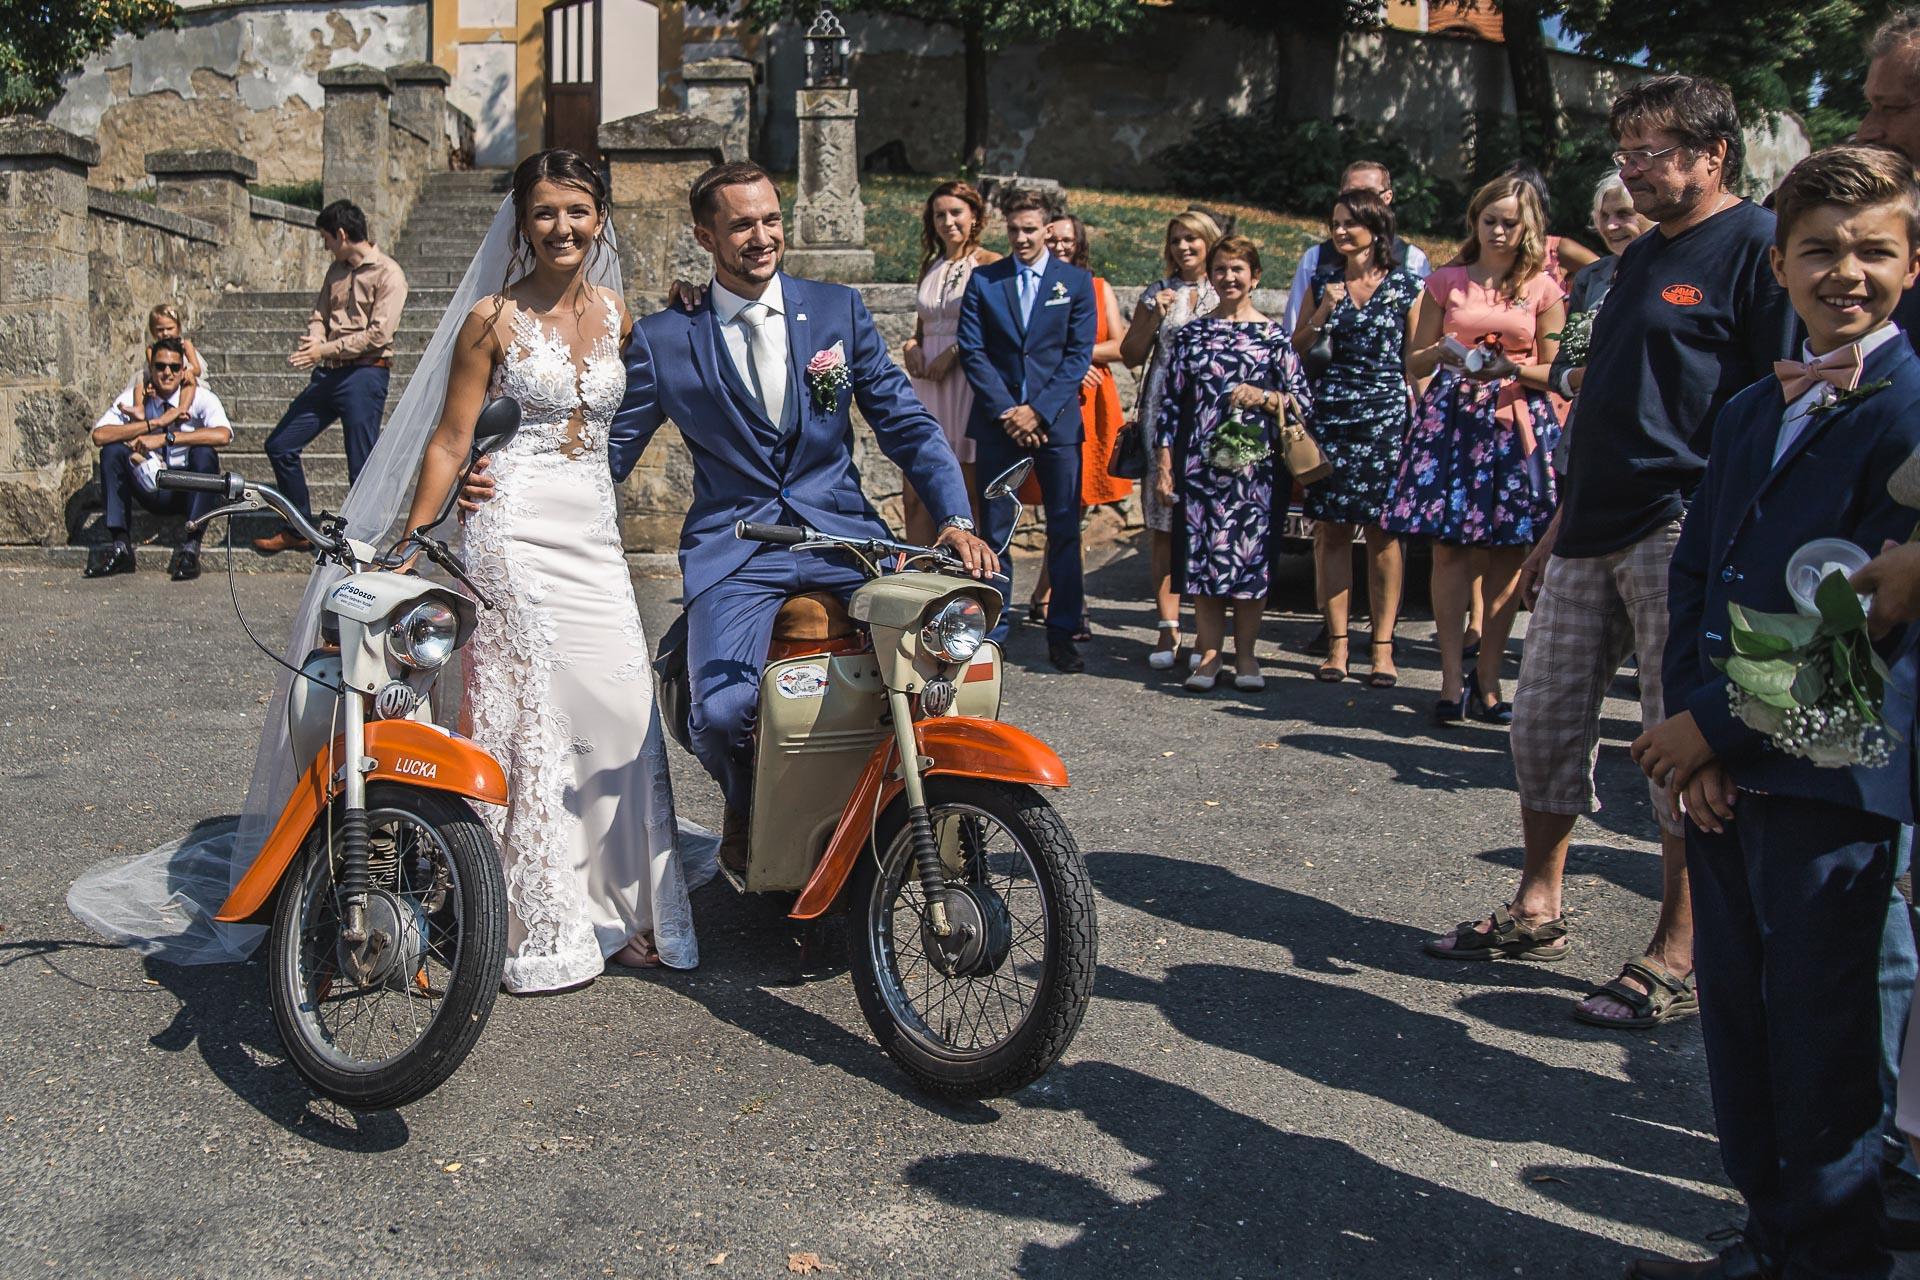 svatební-fotograf-wedding-svatebni-video-orlík-vltava-kostel-statek-stodola-boho-svatba-Beautyfoto-307